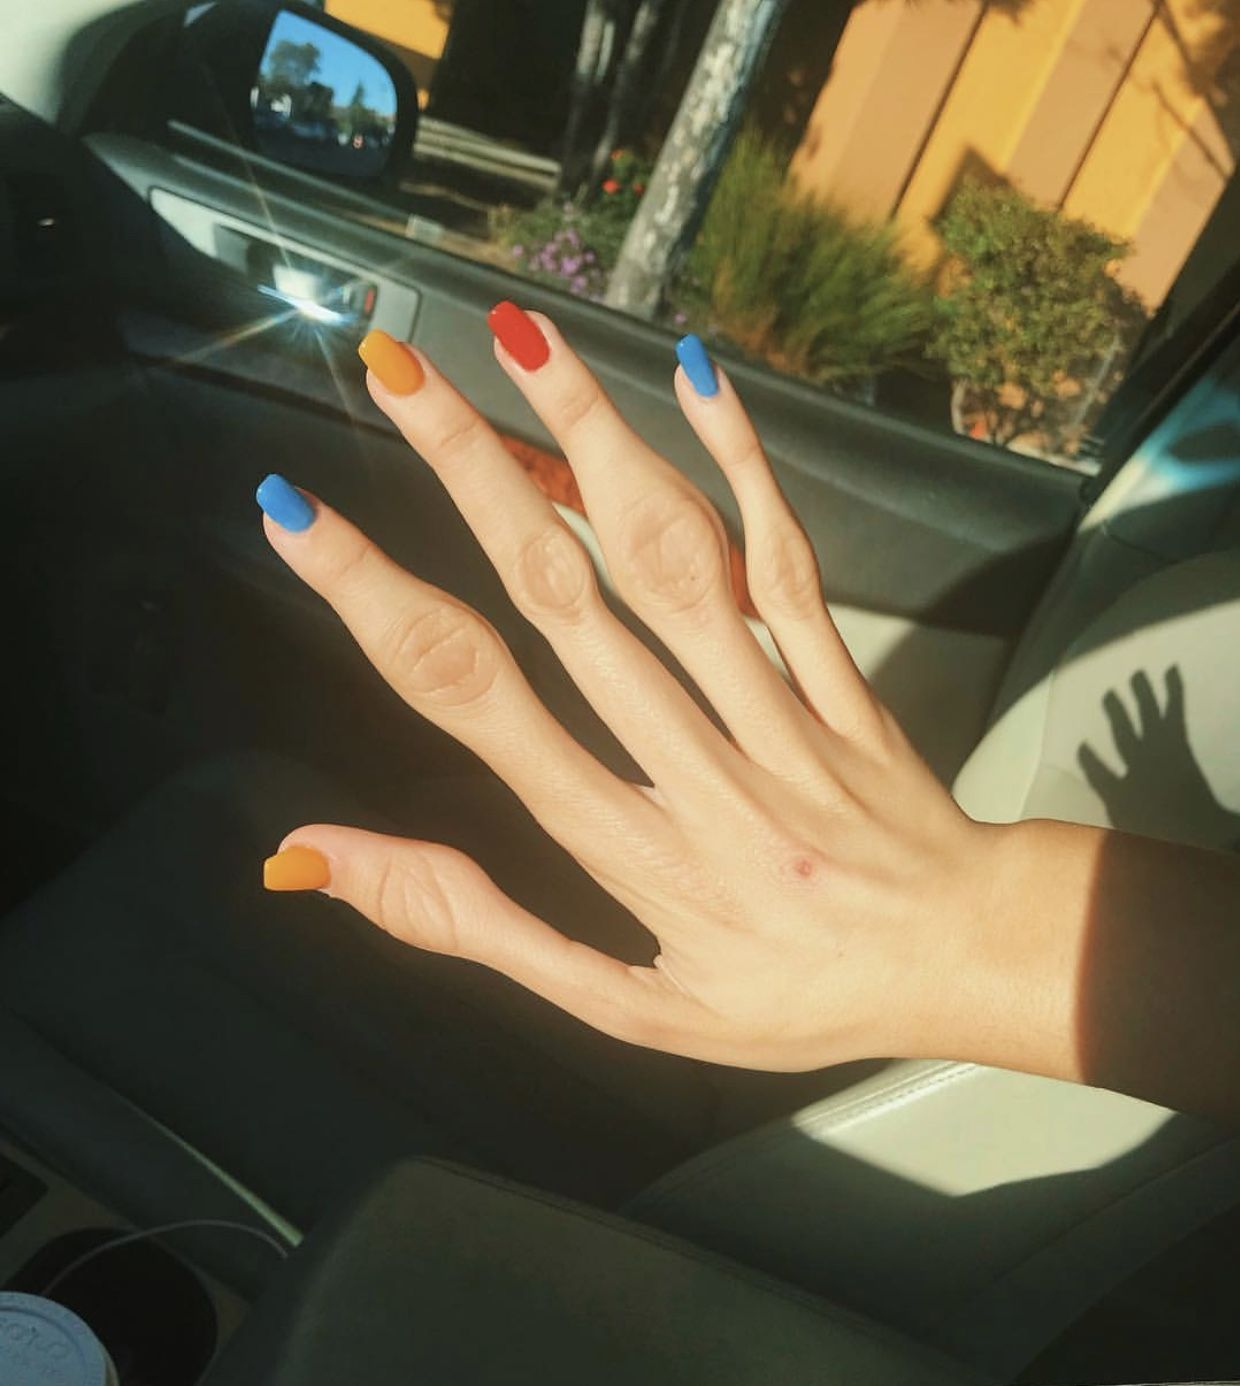 Emma Chamberlain S Yellow Red And Blue Acrylic Nails Acrylic Nails Yellow Blue Acrylic Nails 90s Nails